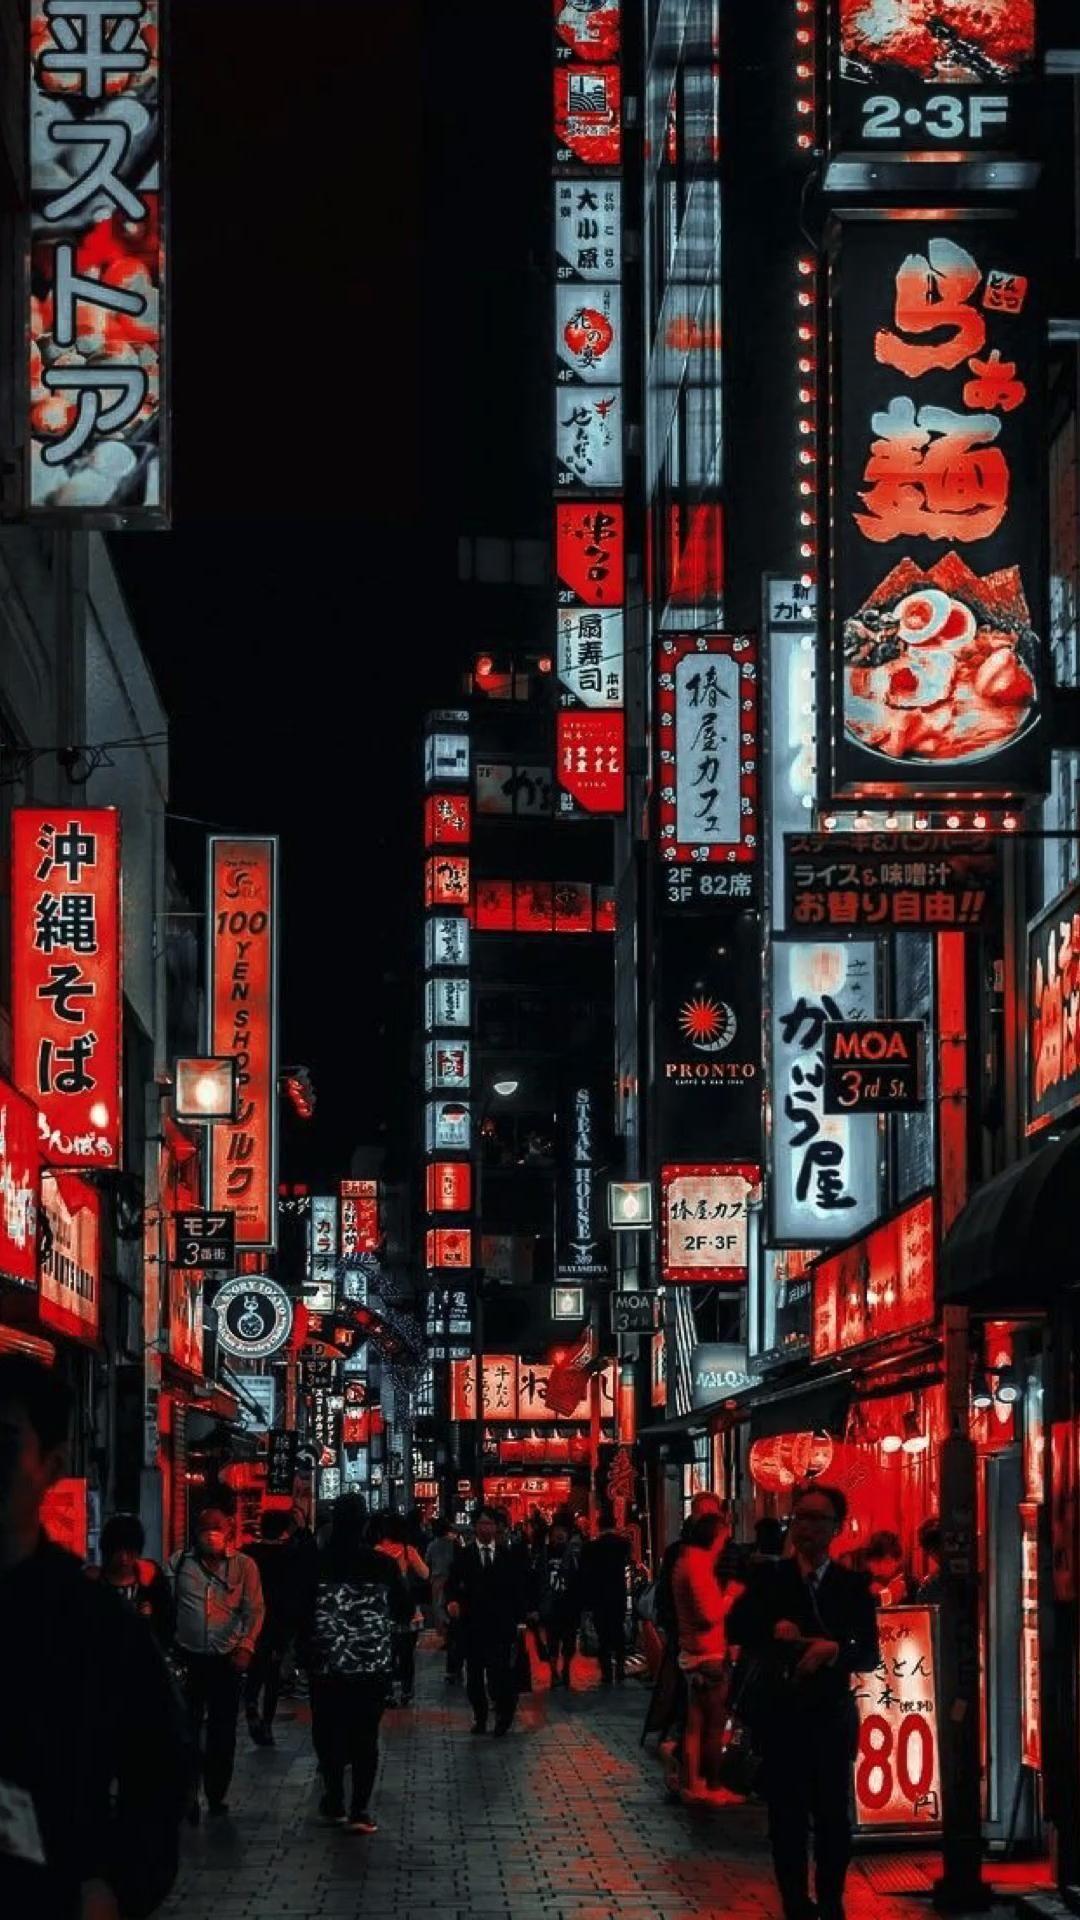 Japan | Tokyo | Night | Street Wear | Red Shades | City Center